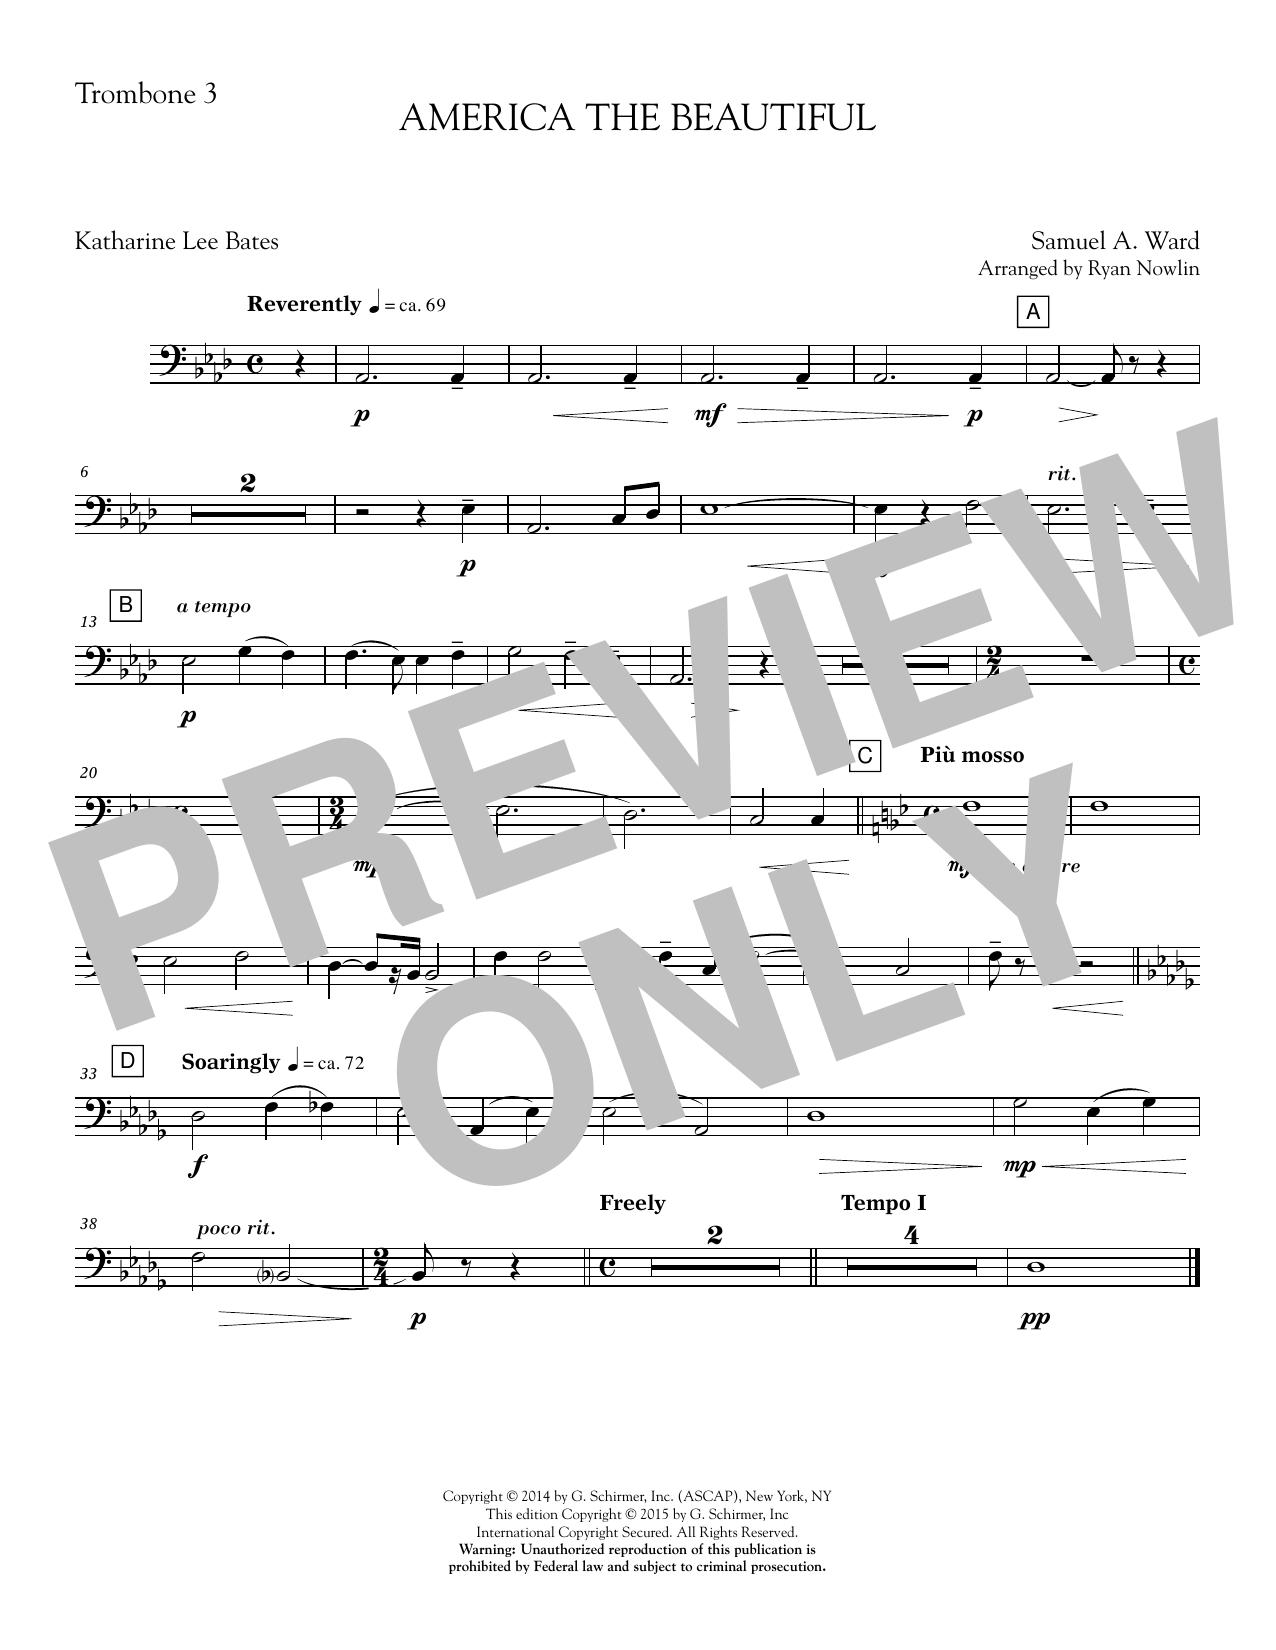 America, the Beautiful - Trombone 3 Sheet Music